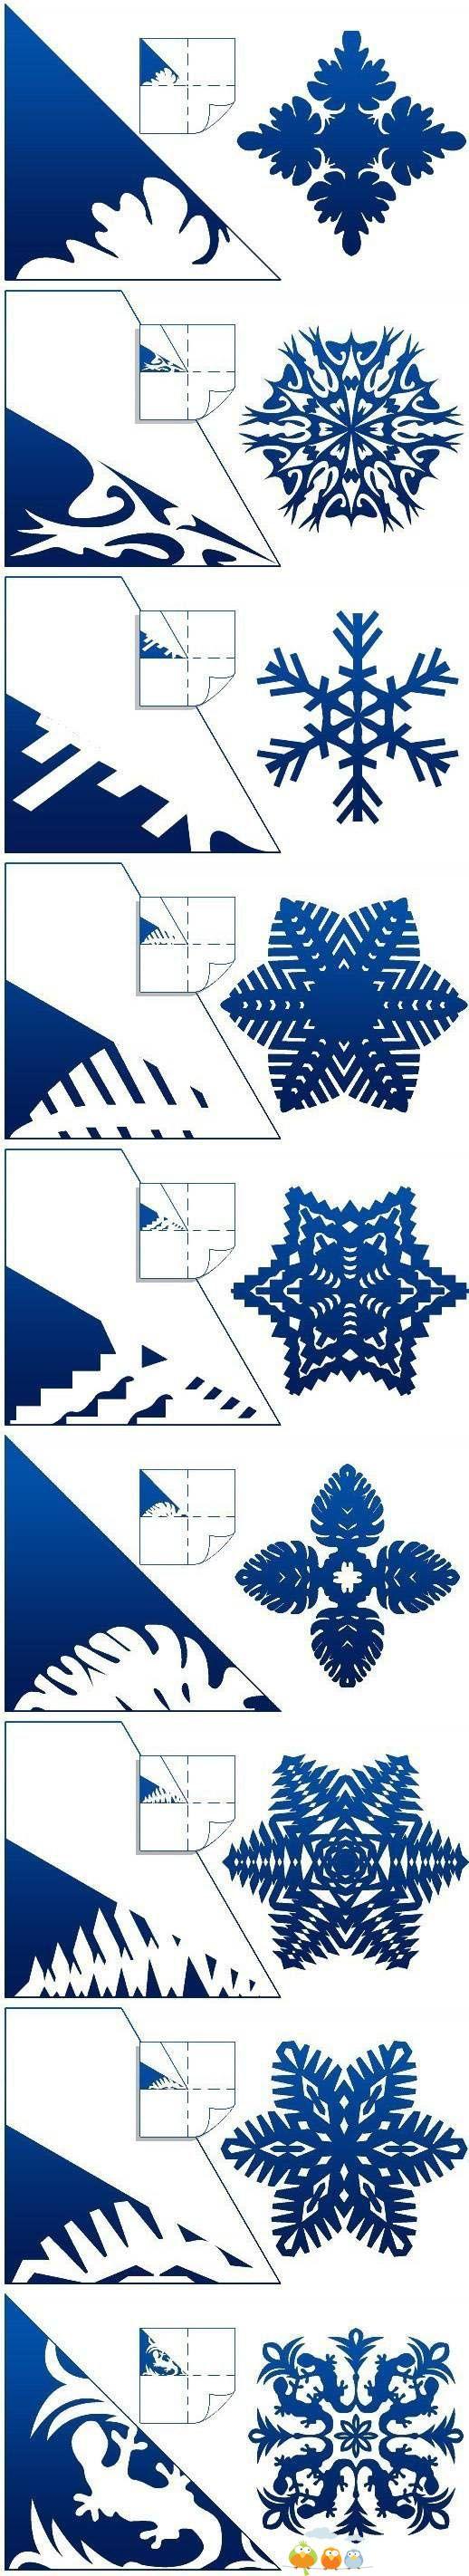 snowflakes-diy-patrons